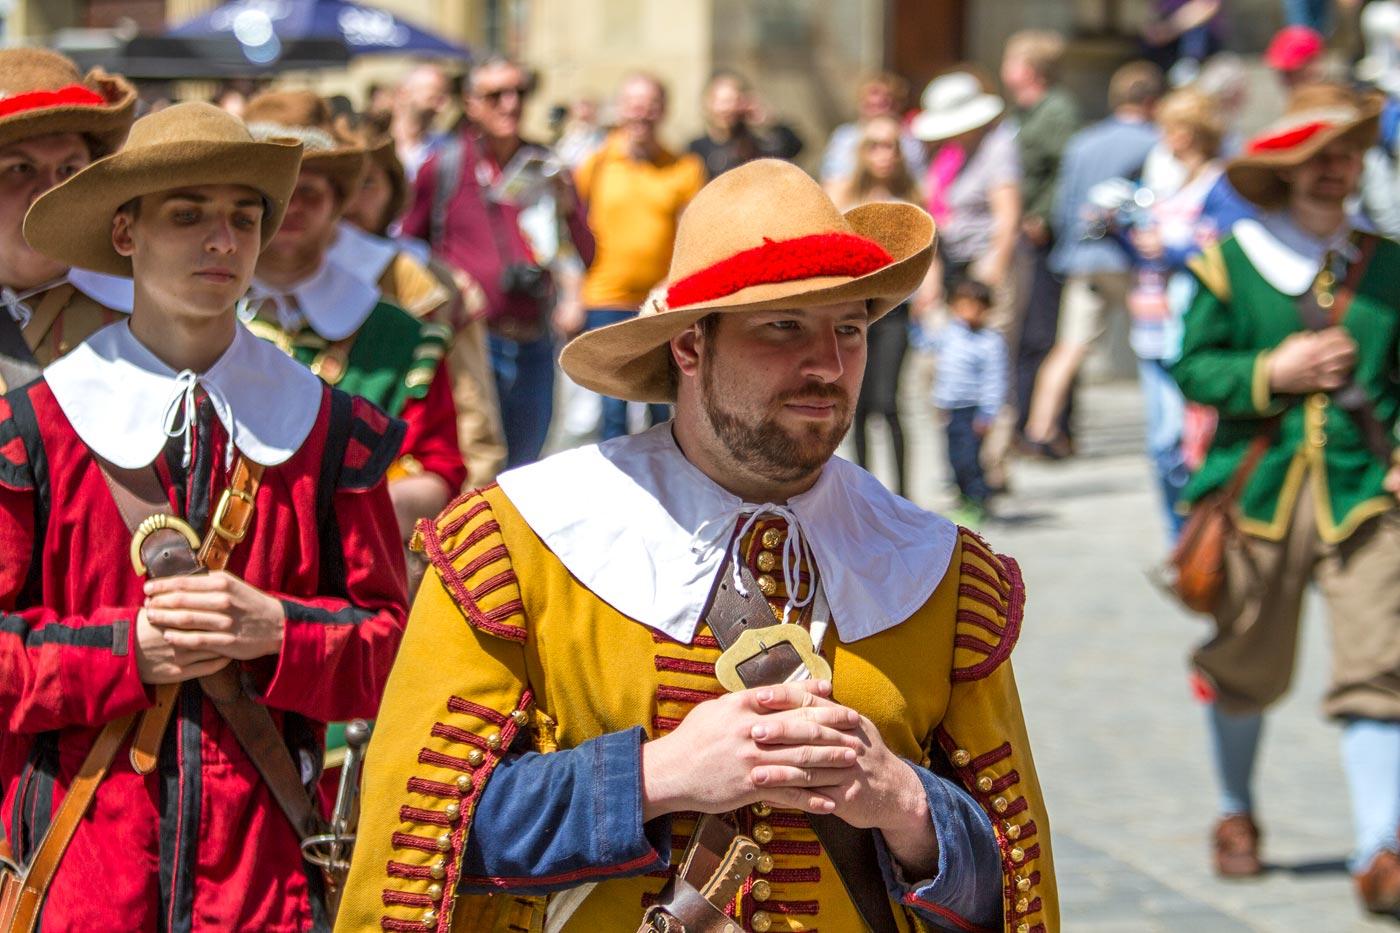 Костюмированный парад, Ротенбург на Таубере, Германия